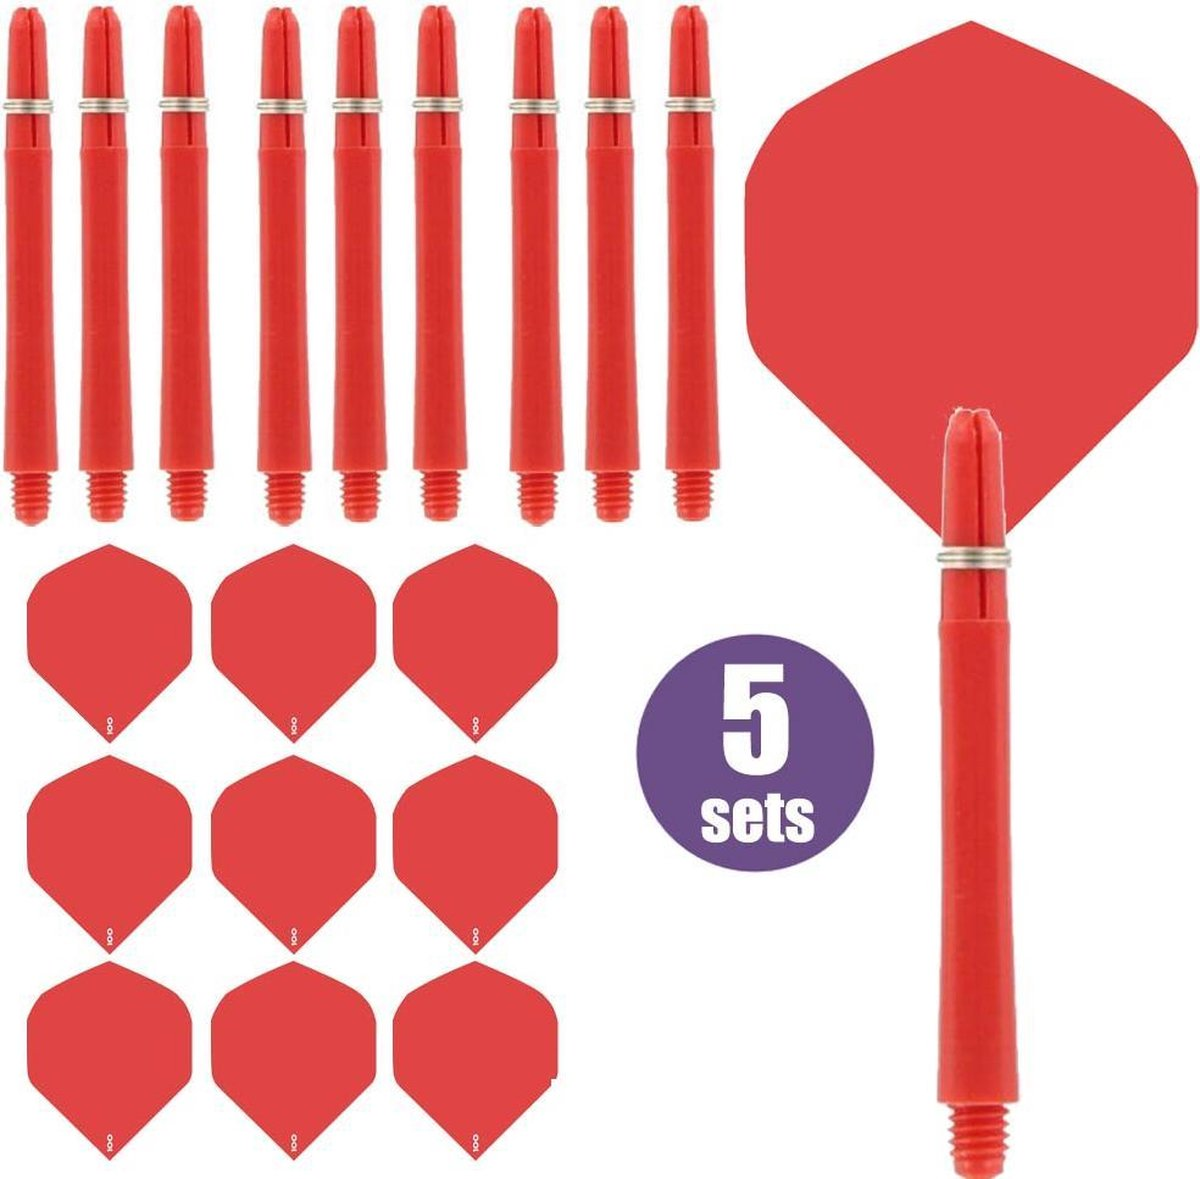 ABC Darts - Dart Flights en Dart Shafts - Rood - 5 sets